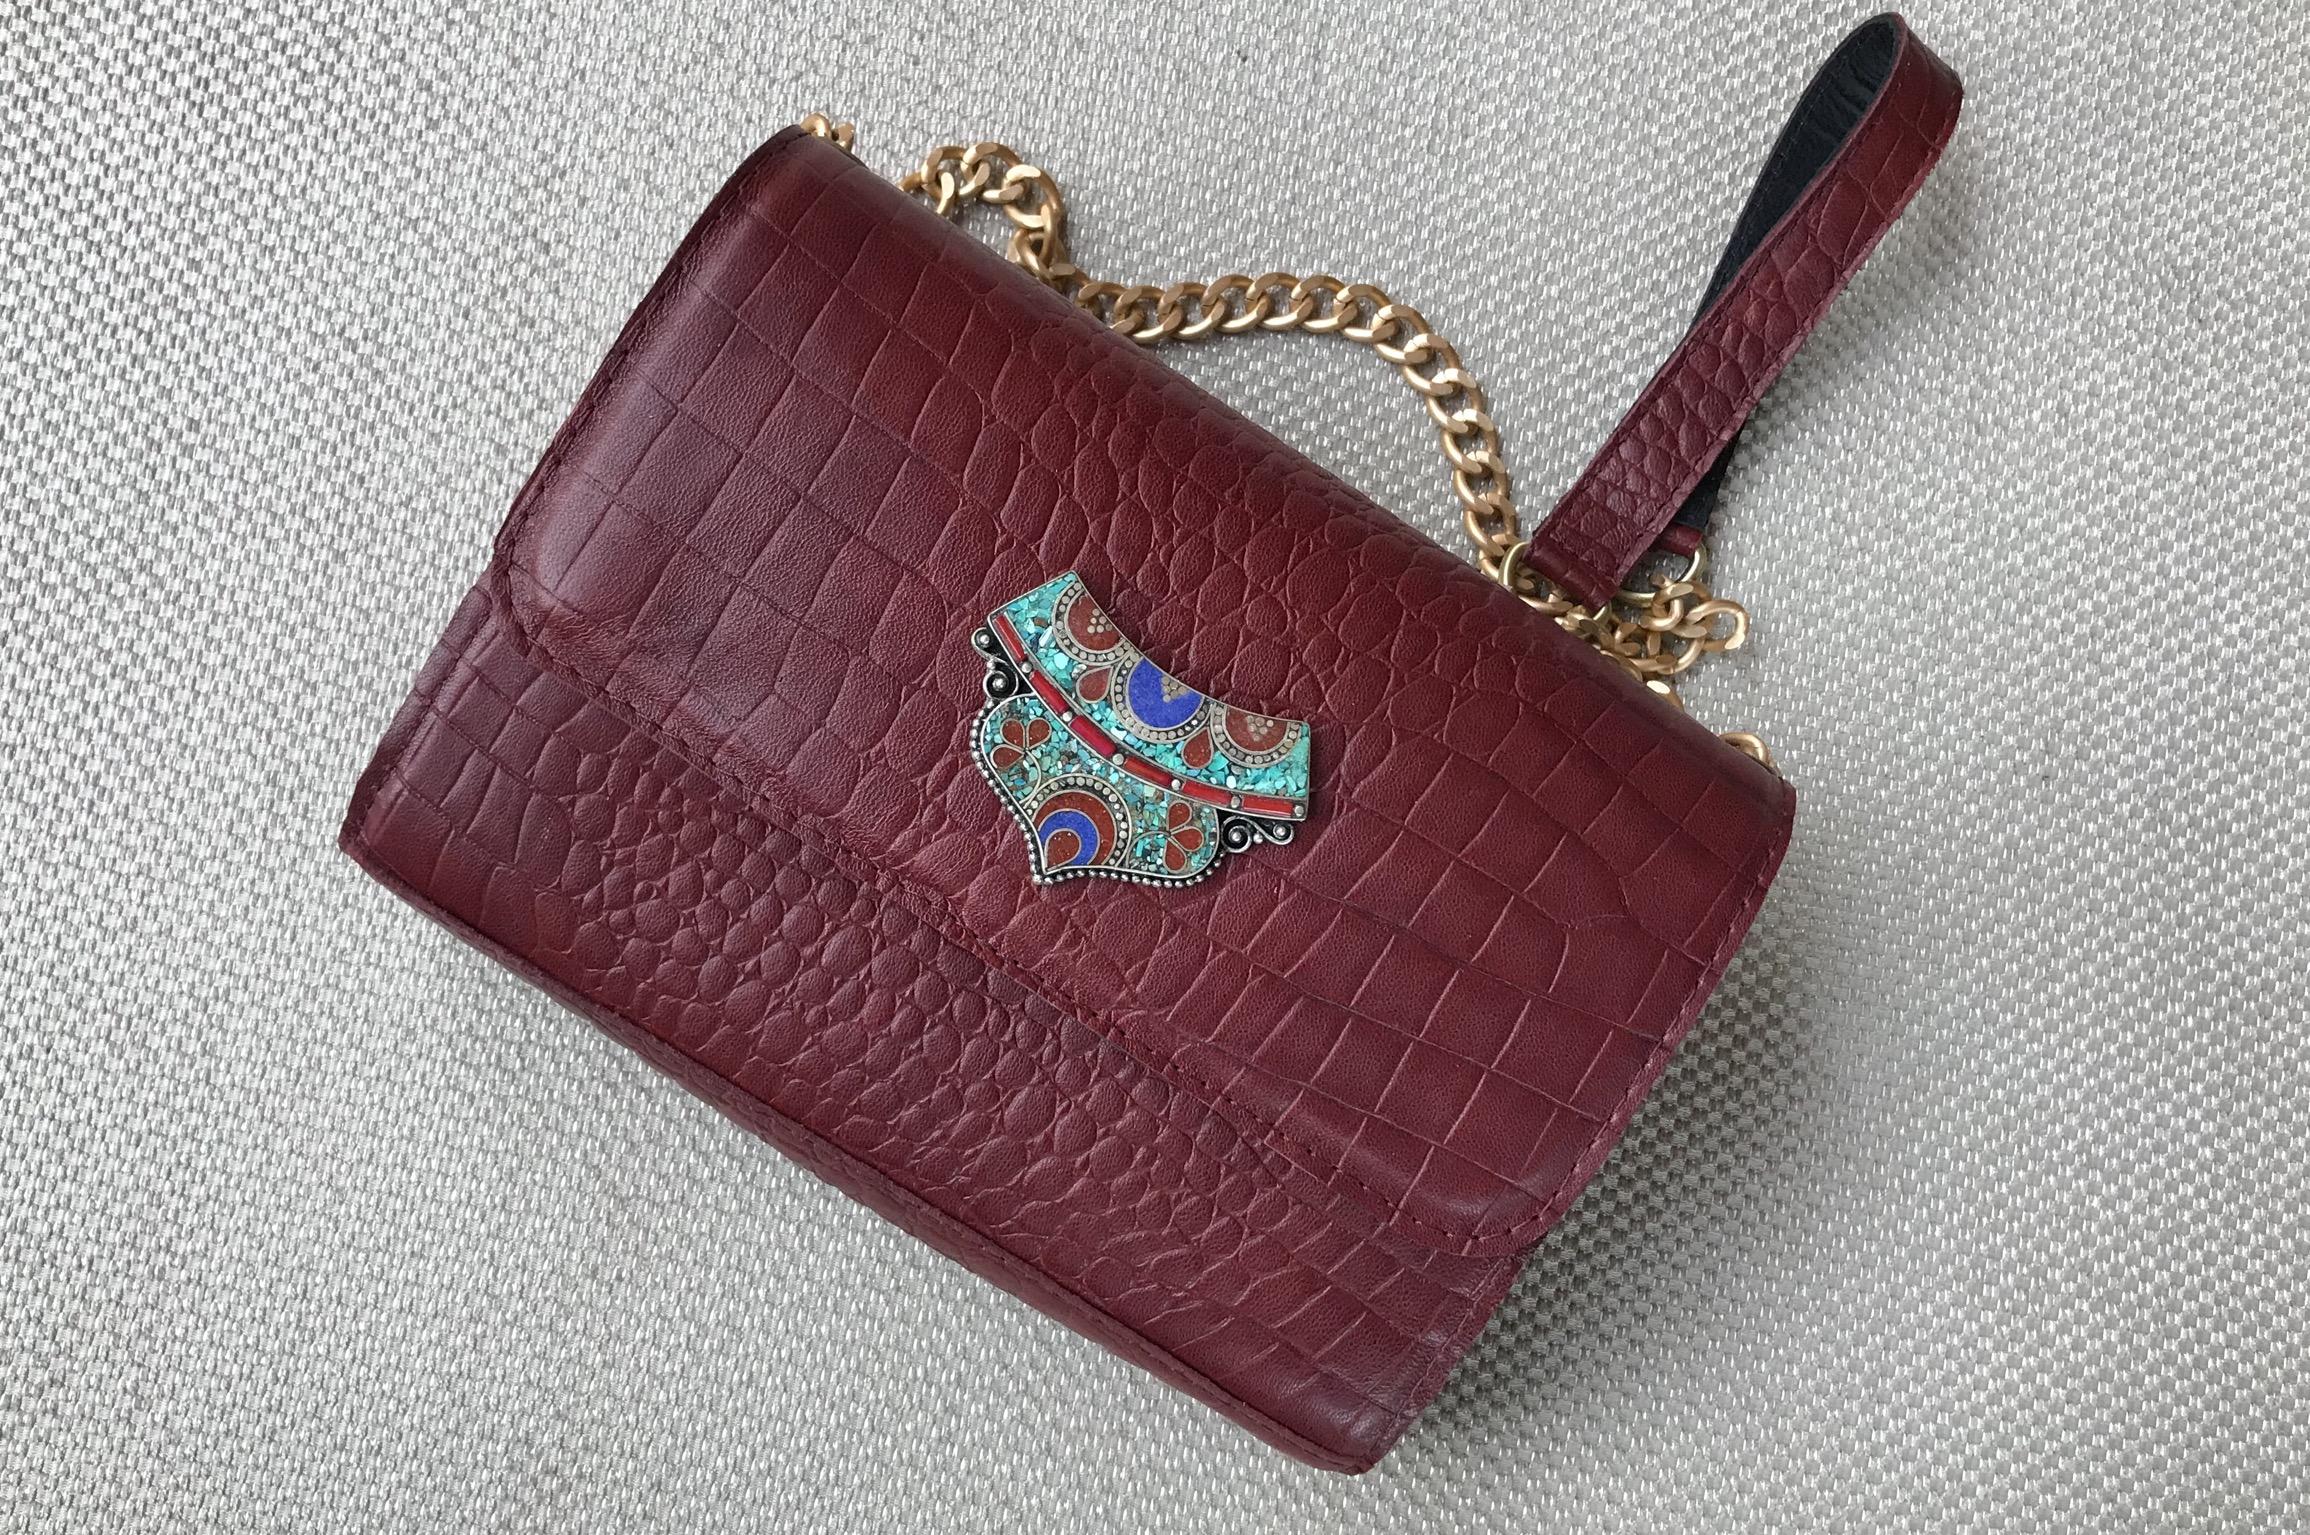 Bag leather croco burgundy with artisanal jewelry